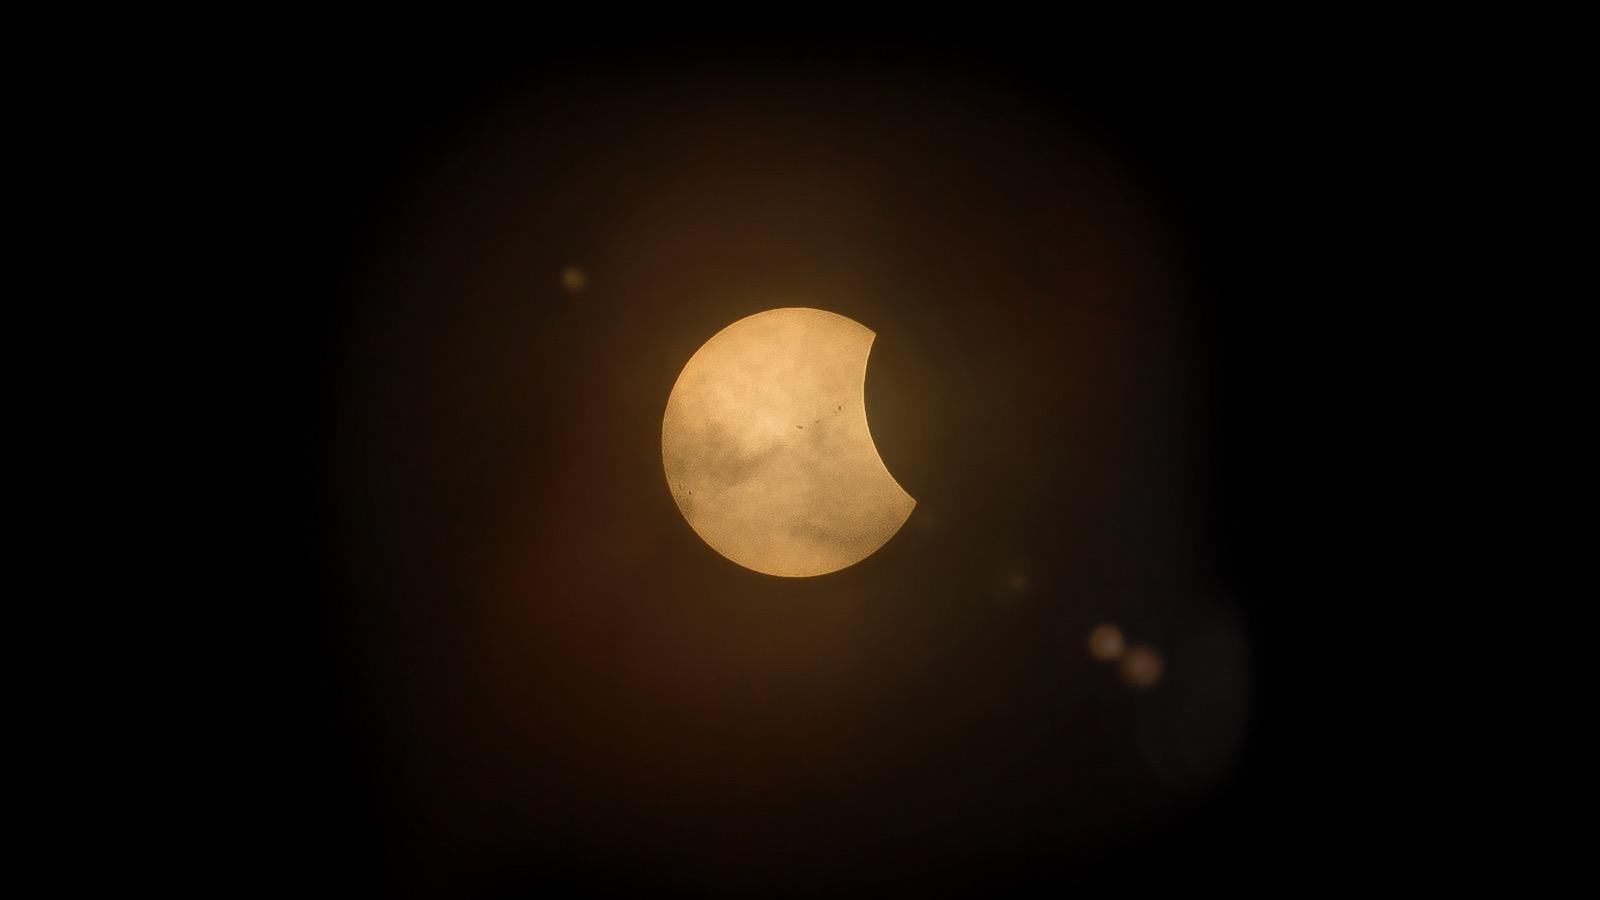 eclips, zonsverduistering, jeanette groenendaal, horoscoop, astrologie